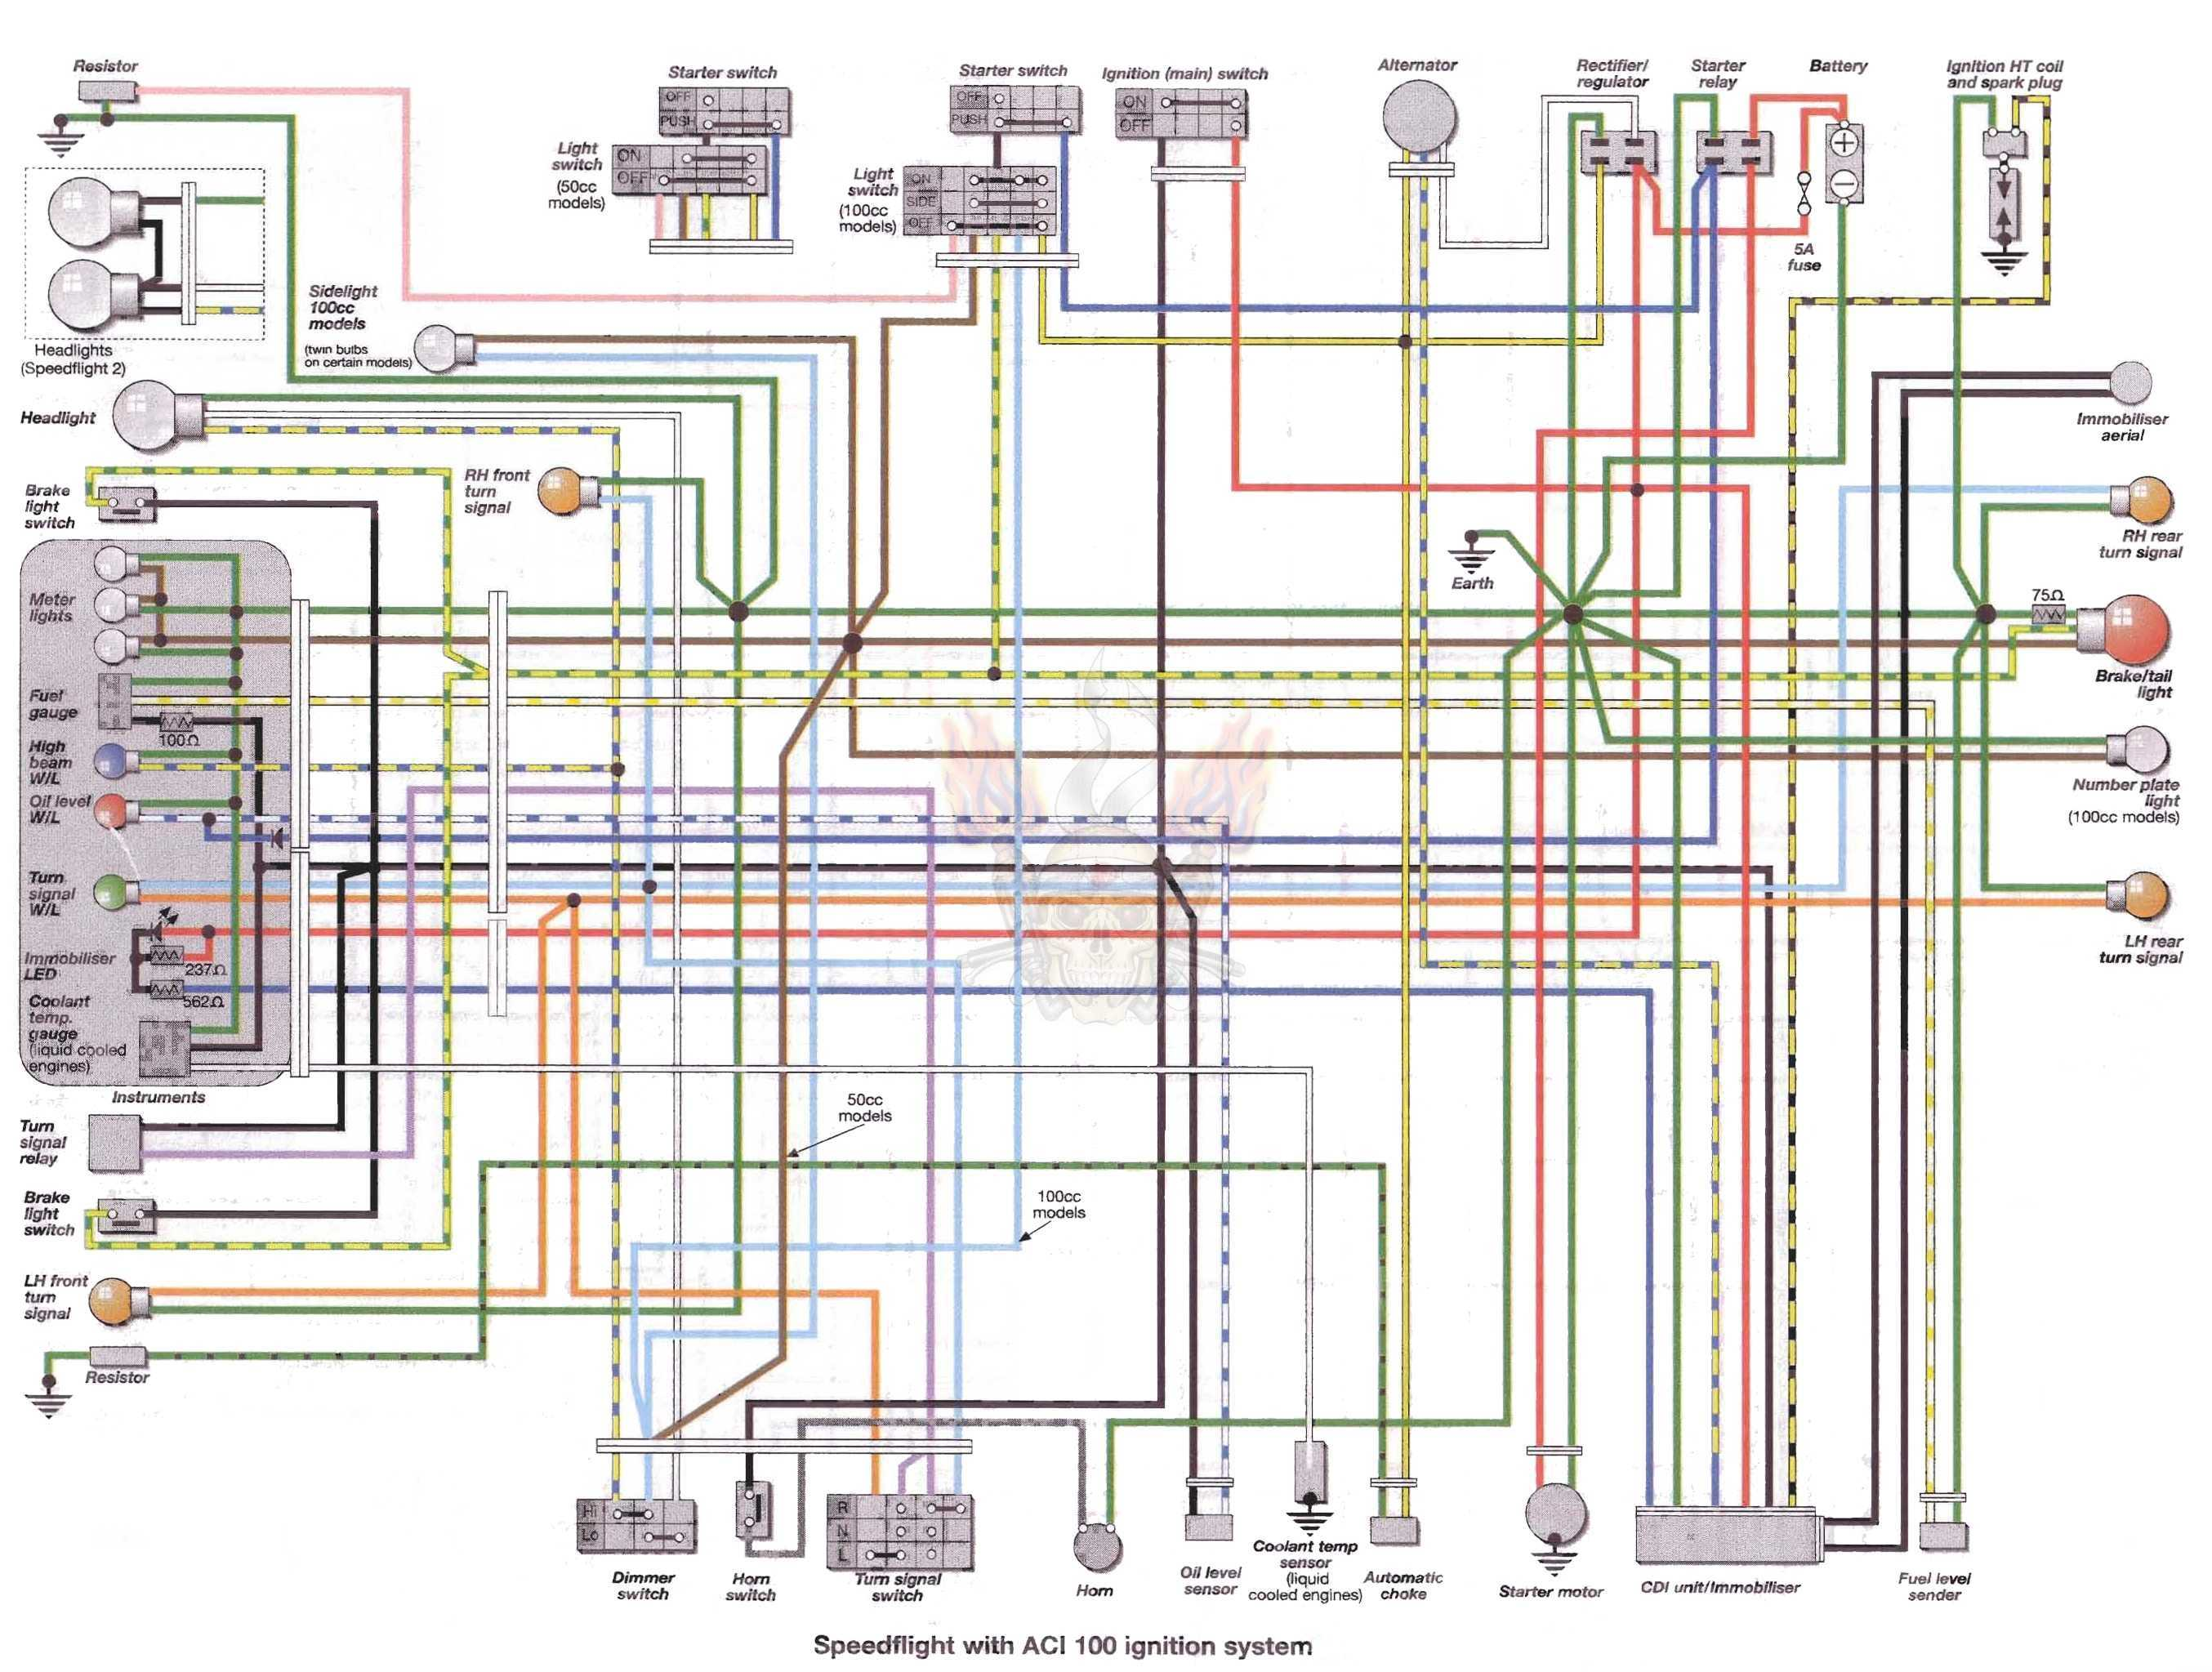 2012 50cc Jonway Scooter Wiring Diagram List Of Schematic Circuit Moped Headlights Yamaha U2022 For Free Rh Workingtools Org